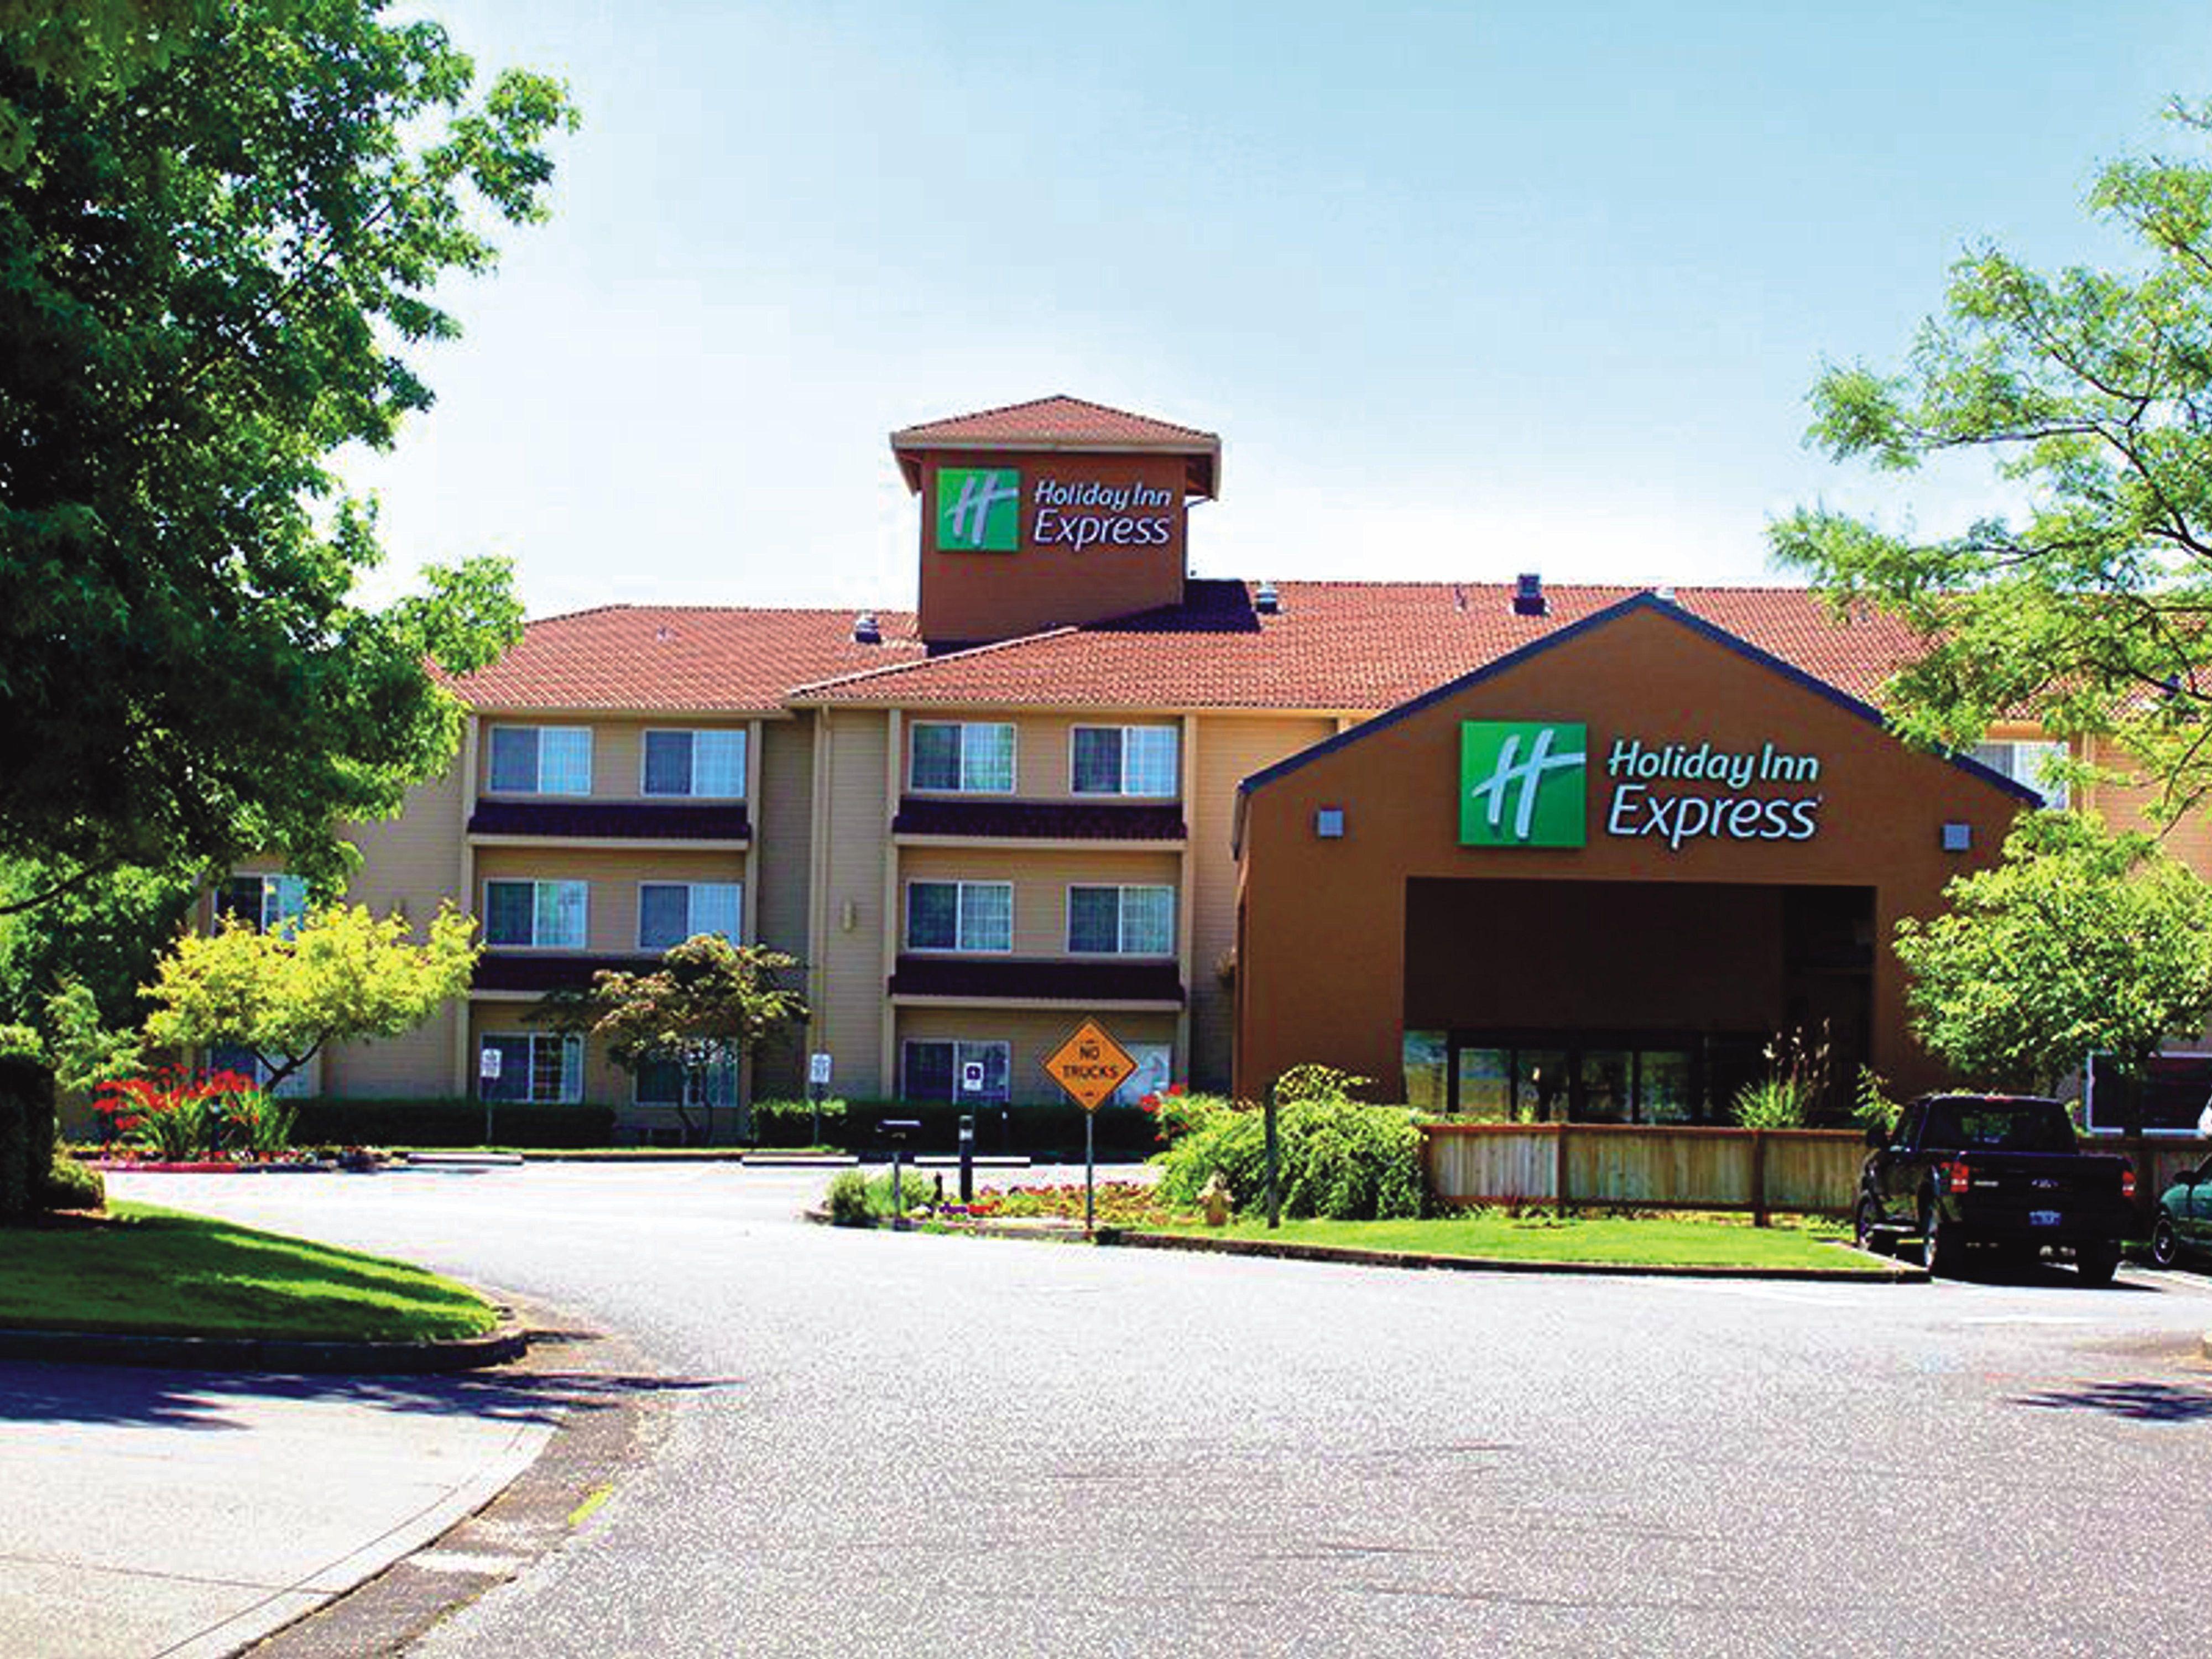 Holiday Inn Express South Portland Me Reviews